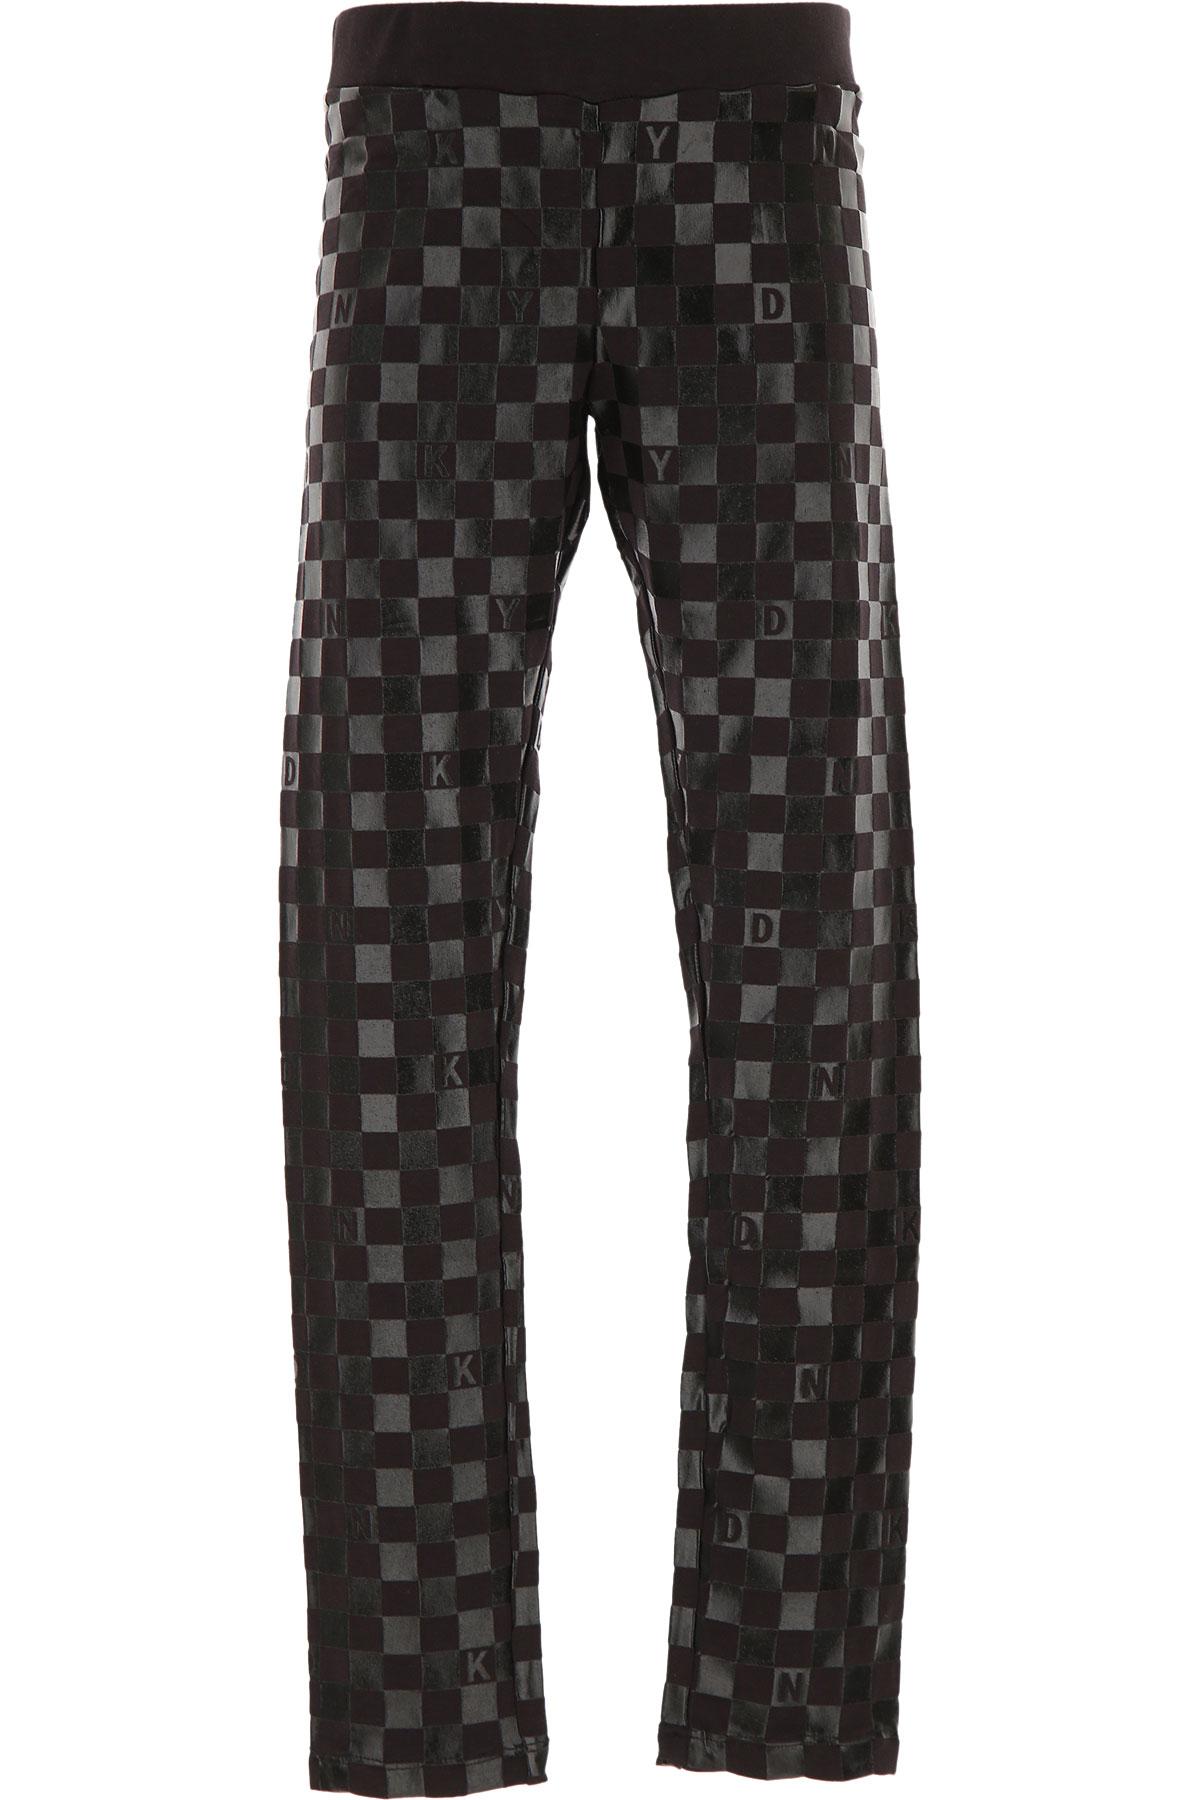 DKNY Kids Pants for Girls On Sale, Black, Cotton, 2019, 10Y 12Y 14Y 16Y 8Y